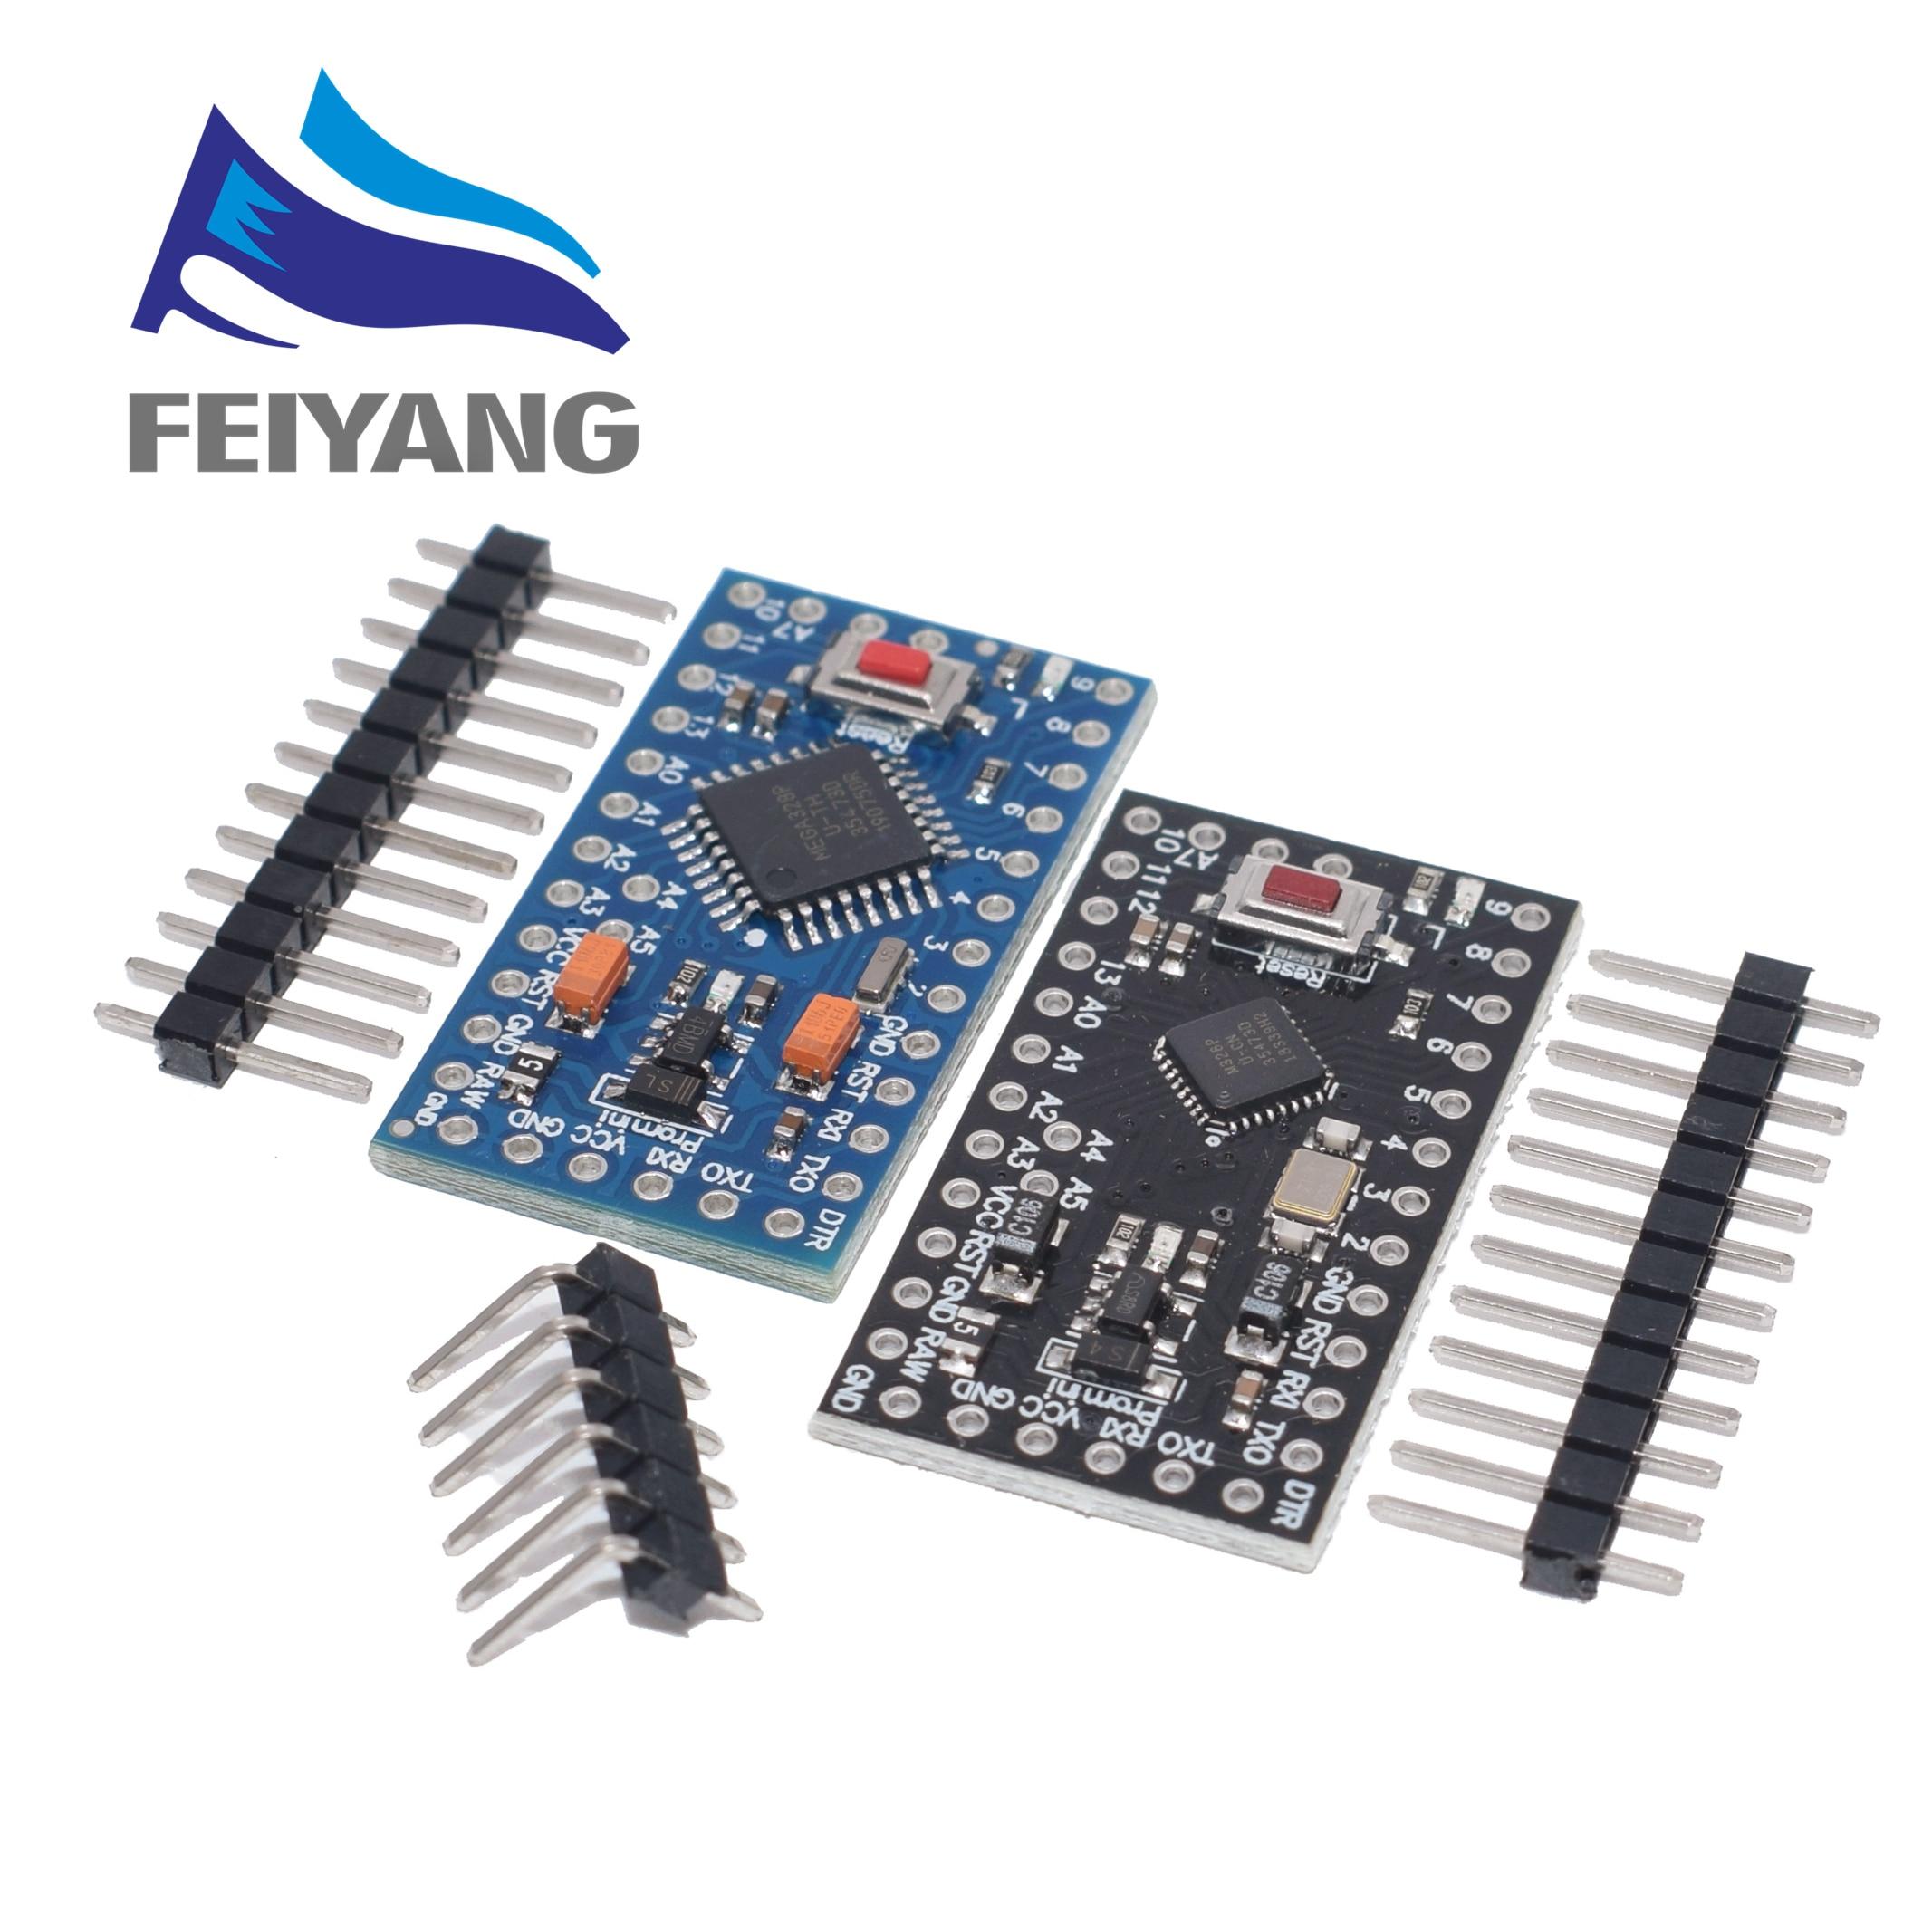 10PCS With The Bootloader ATMEGA328P Pro Mini 5V 16MHz/3.3V 8Mhz 328 Mini ATMEGA328 5V 16MHz